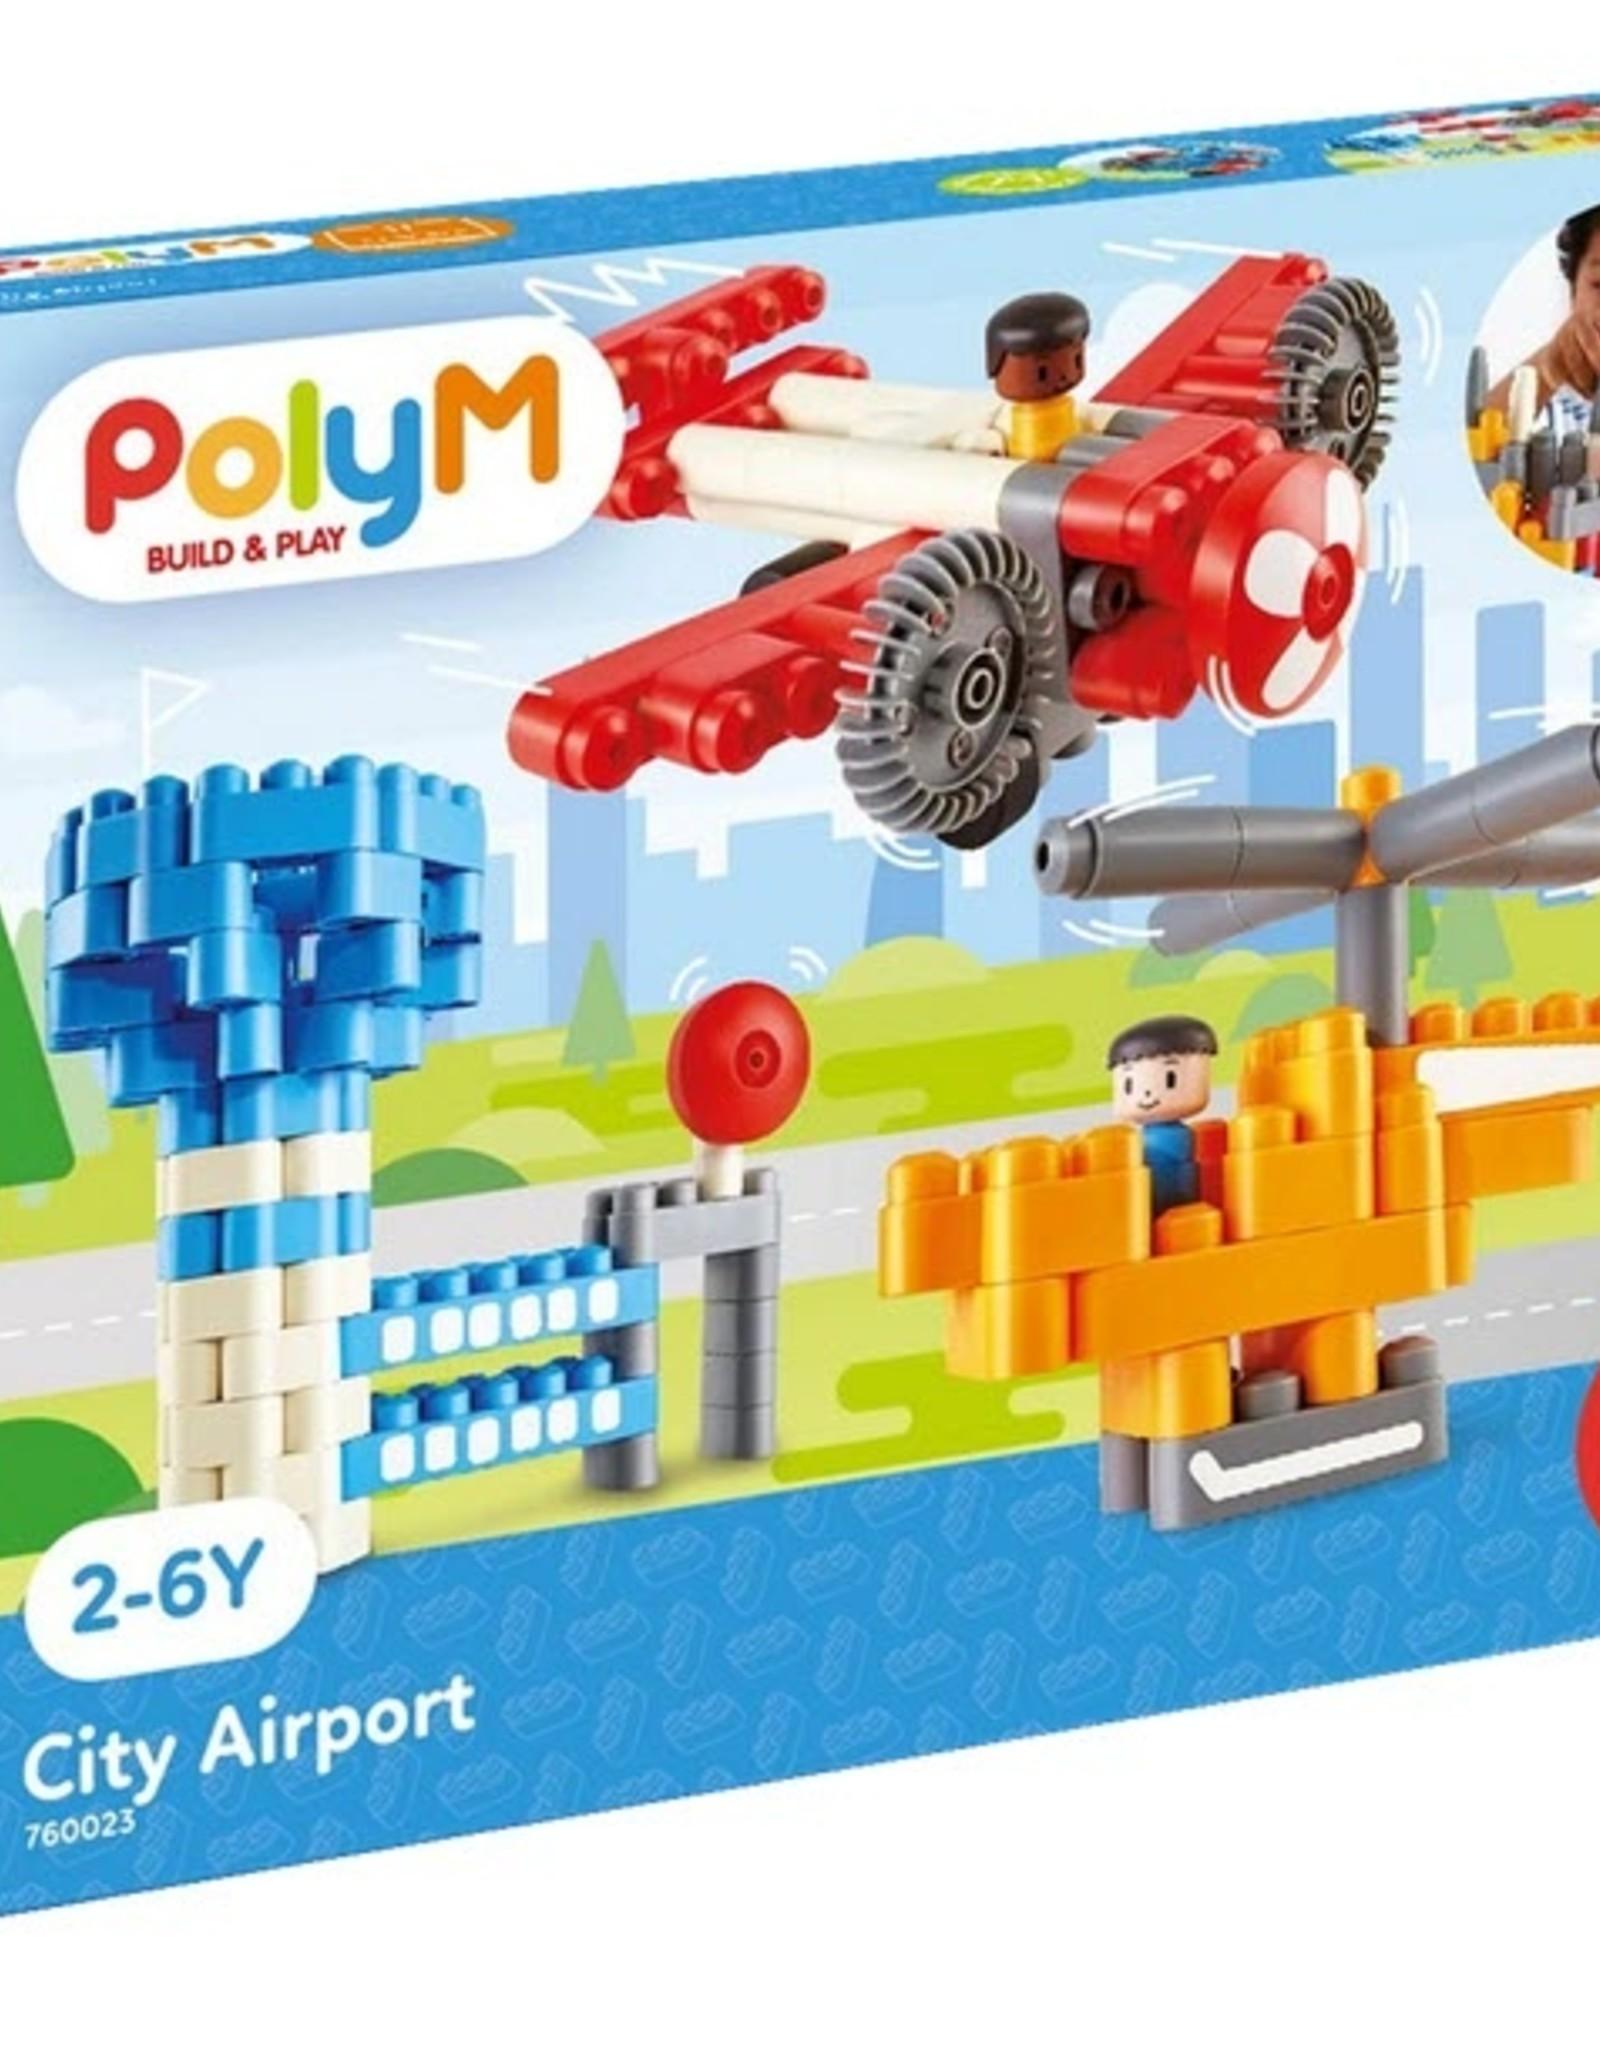 PolyM PolyM - City Airport